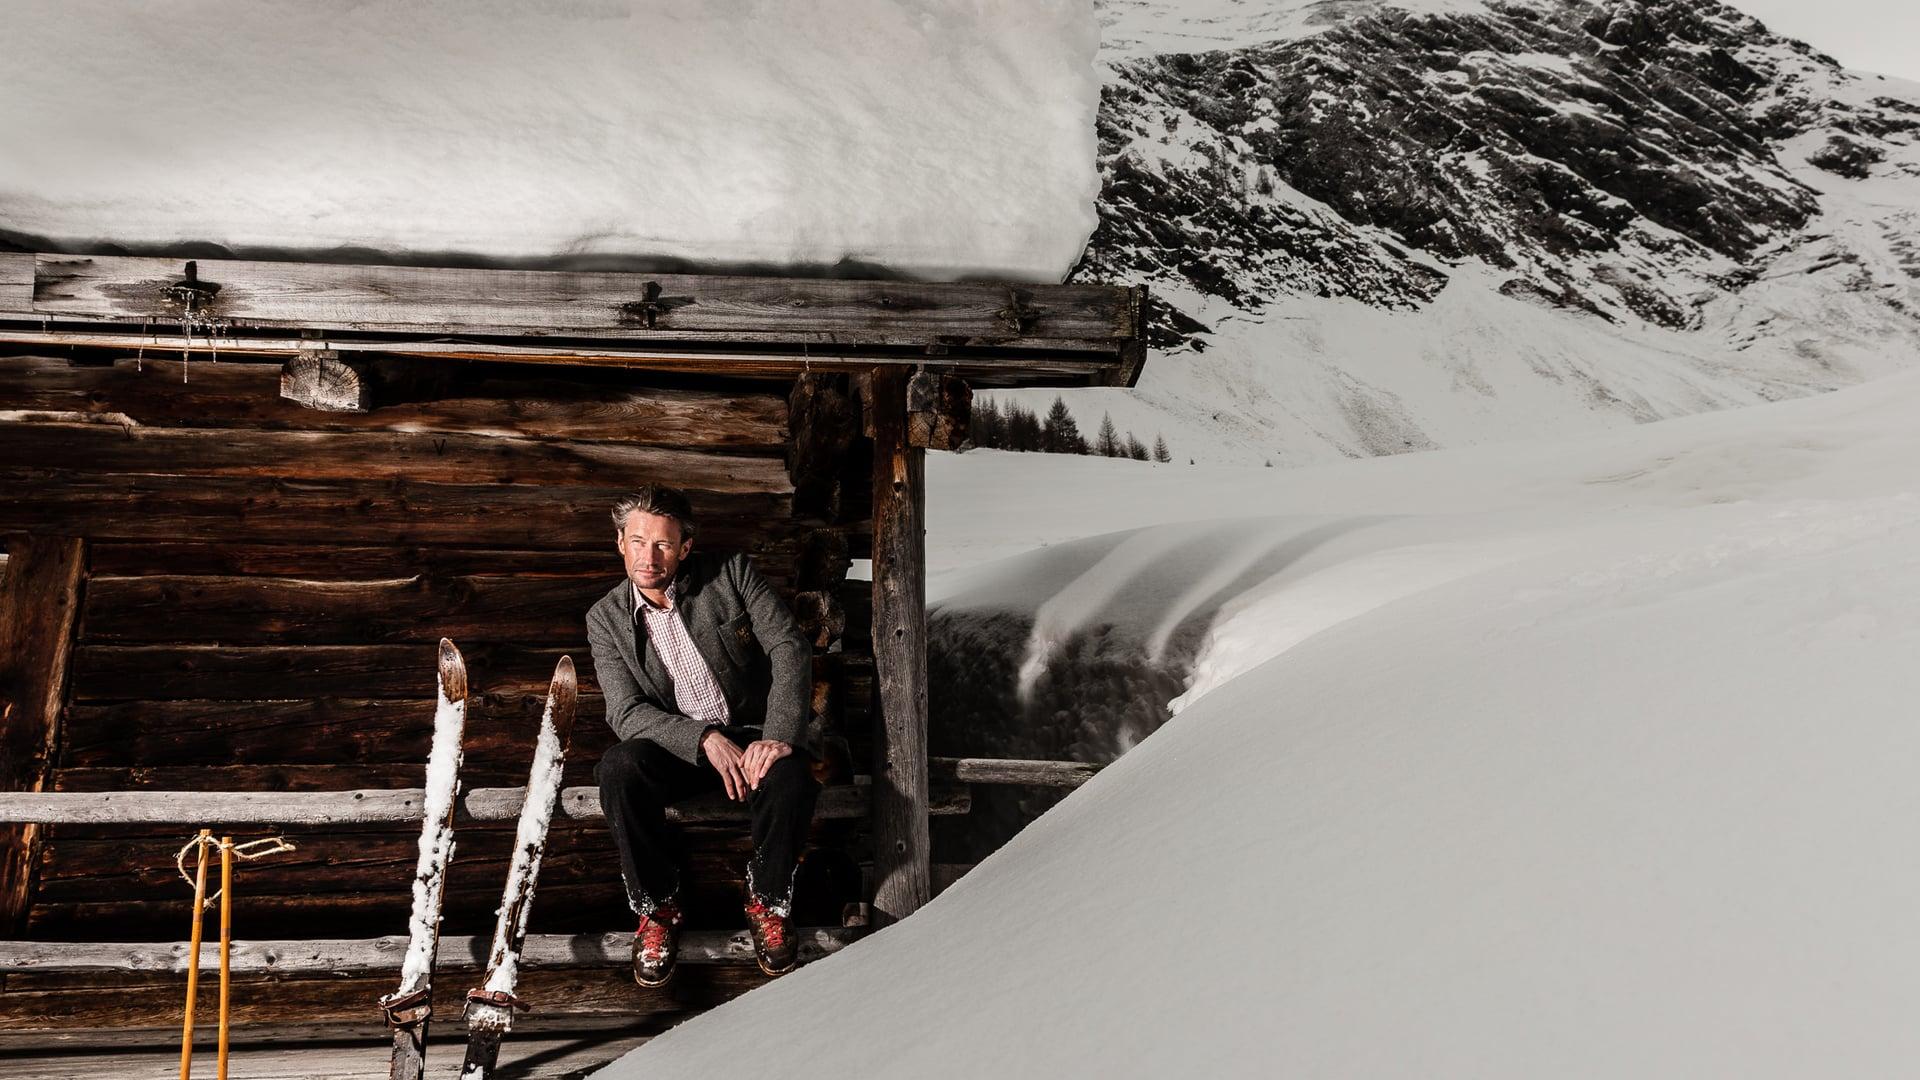 Alpine hut flair